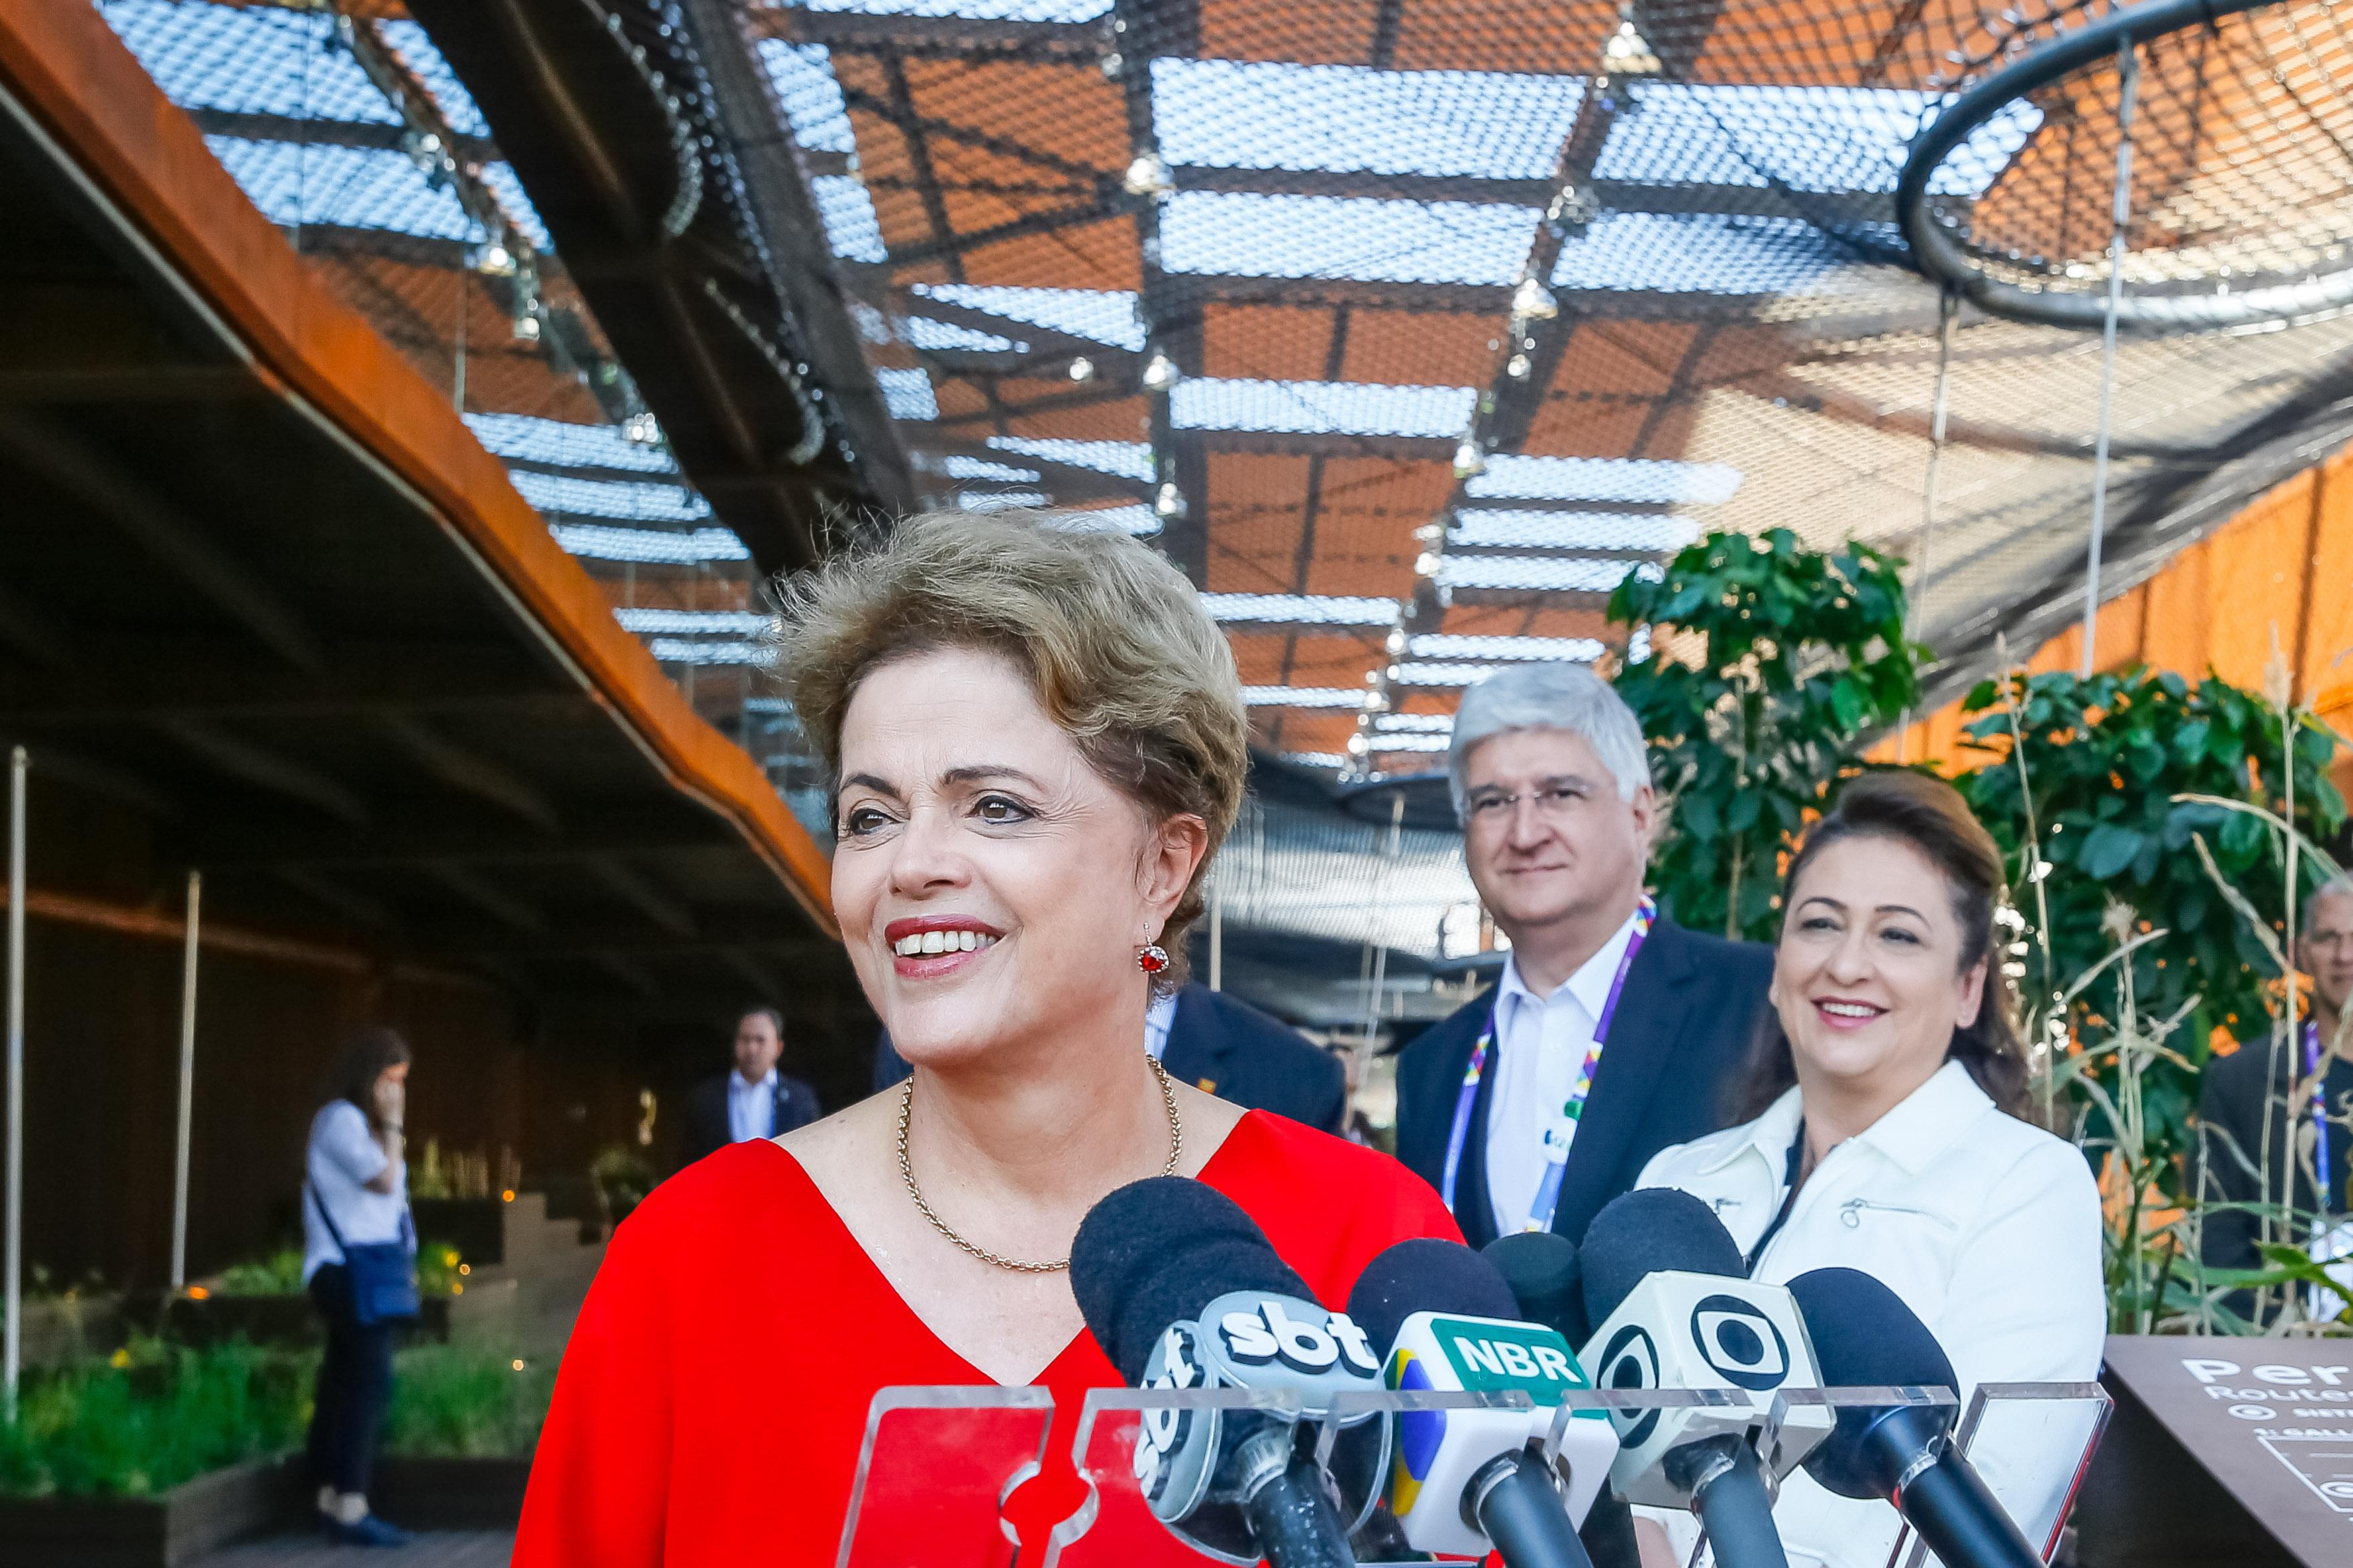 Governo Dilma busca apoio para diminuir crise